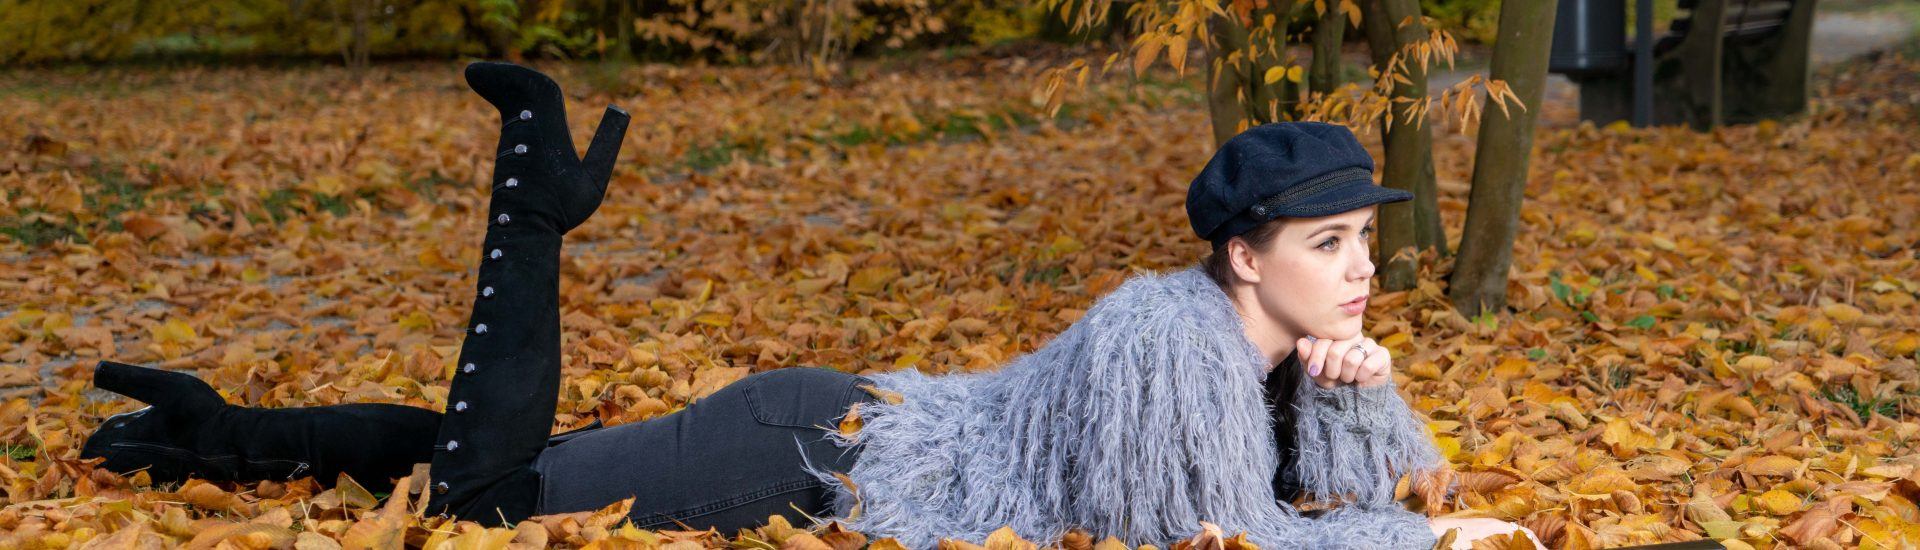 Magic Munich blog - fall photoshooting